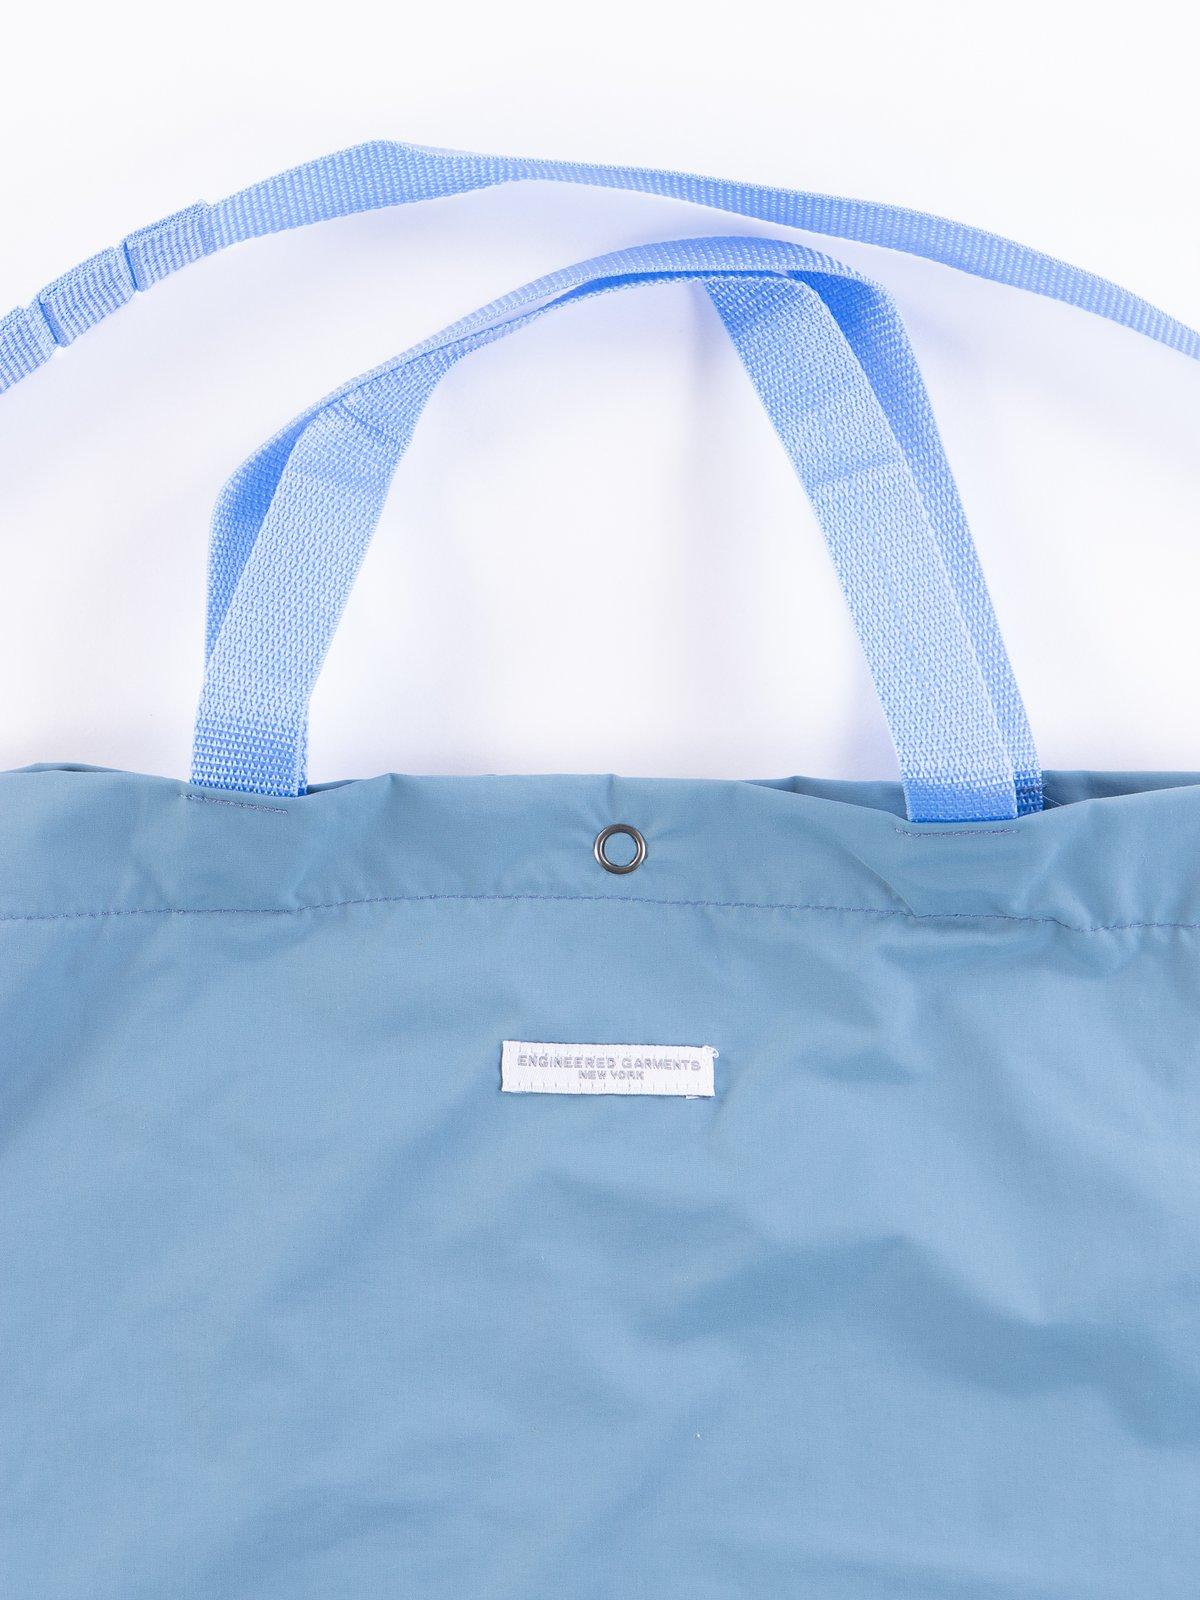 Light Blue Acrylic Coated Nylon Taffeta Carry All Tote - Image 3